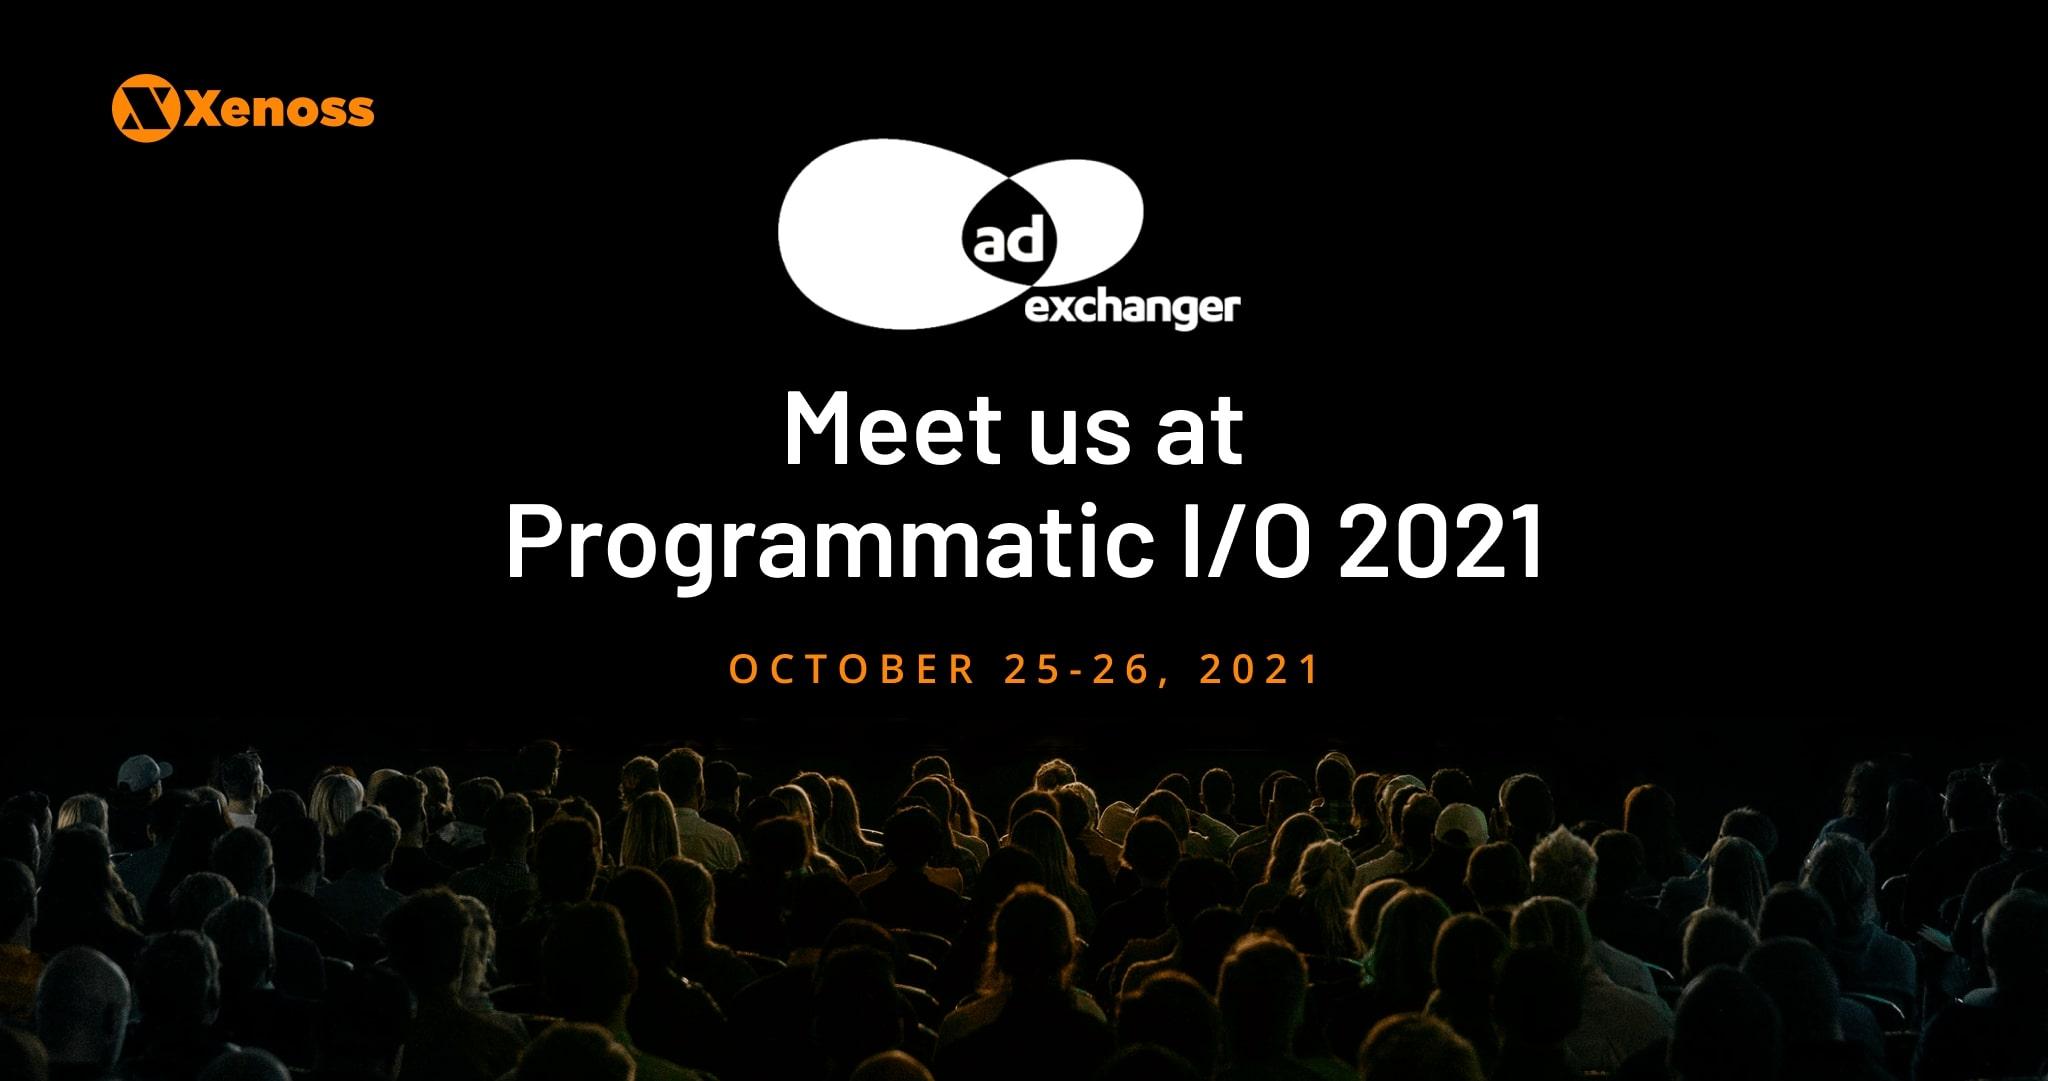 programmatic announcement